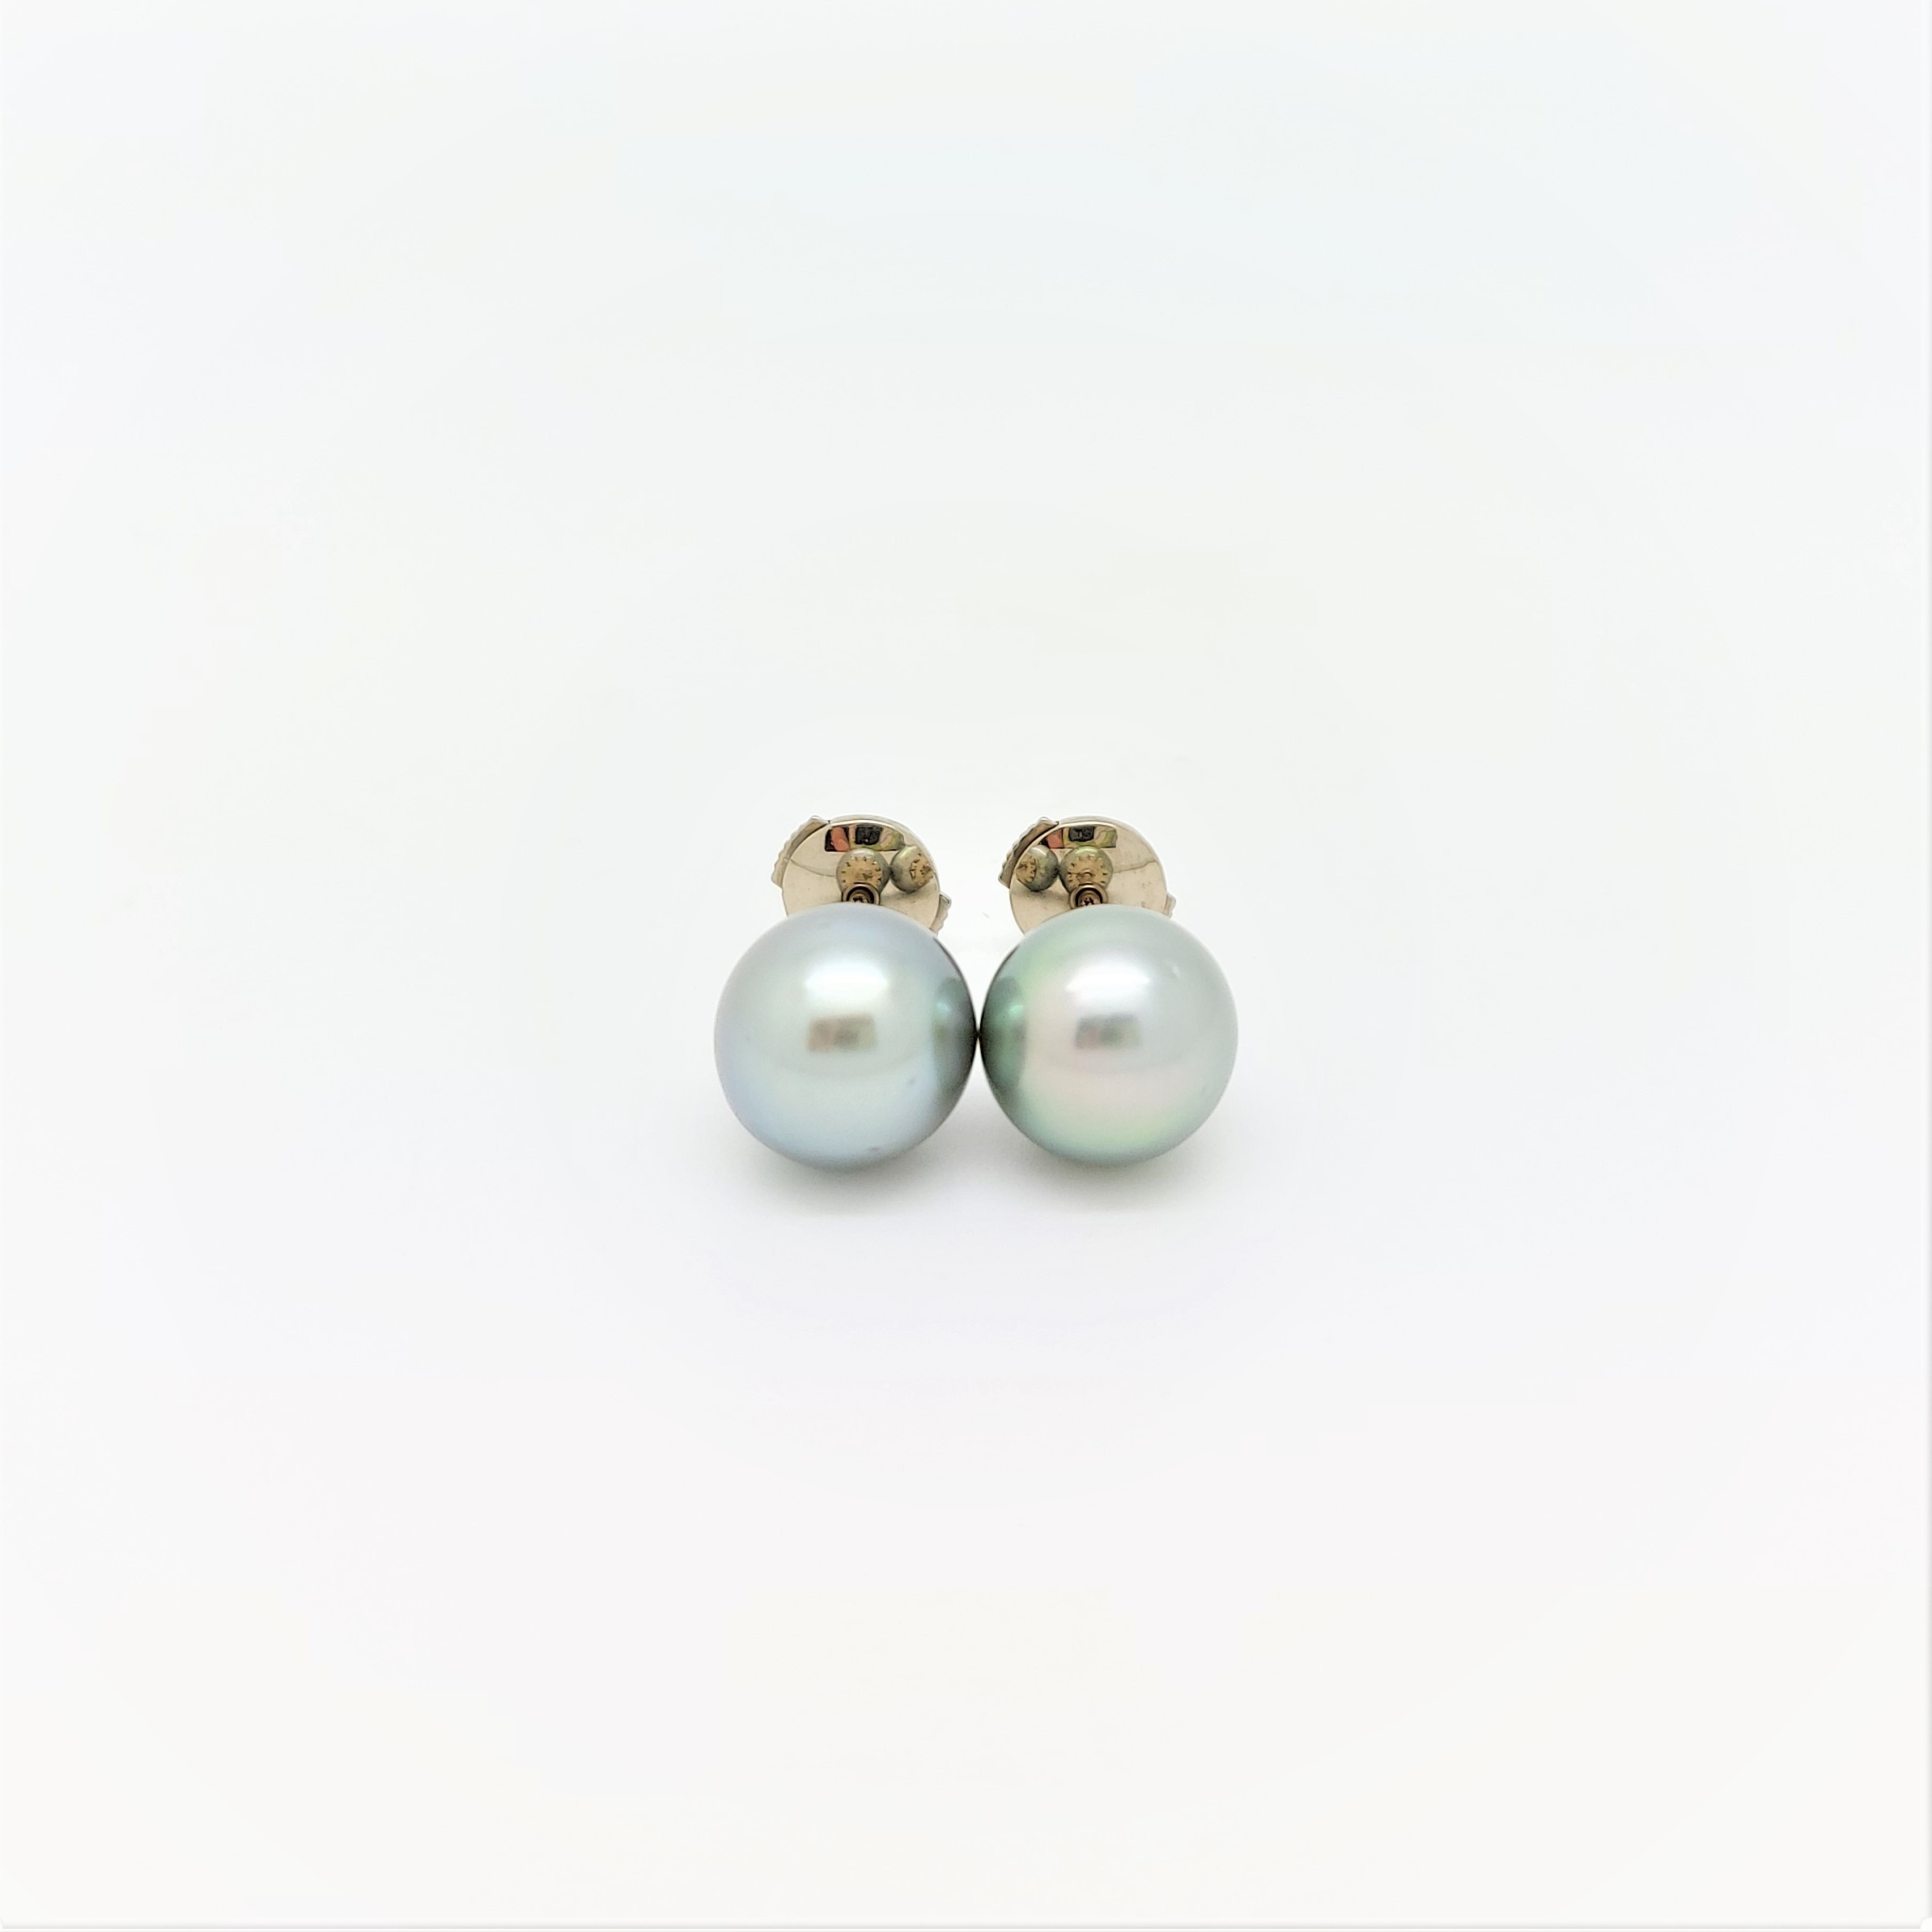 Boutons d\'oreilles 2 perles de Tahiti de 8 mm couleur bleu vert clair